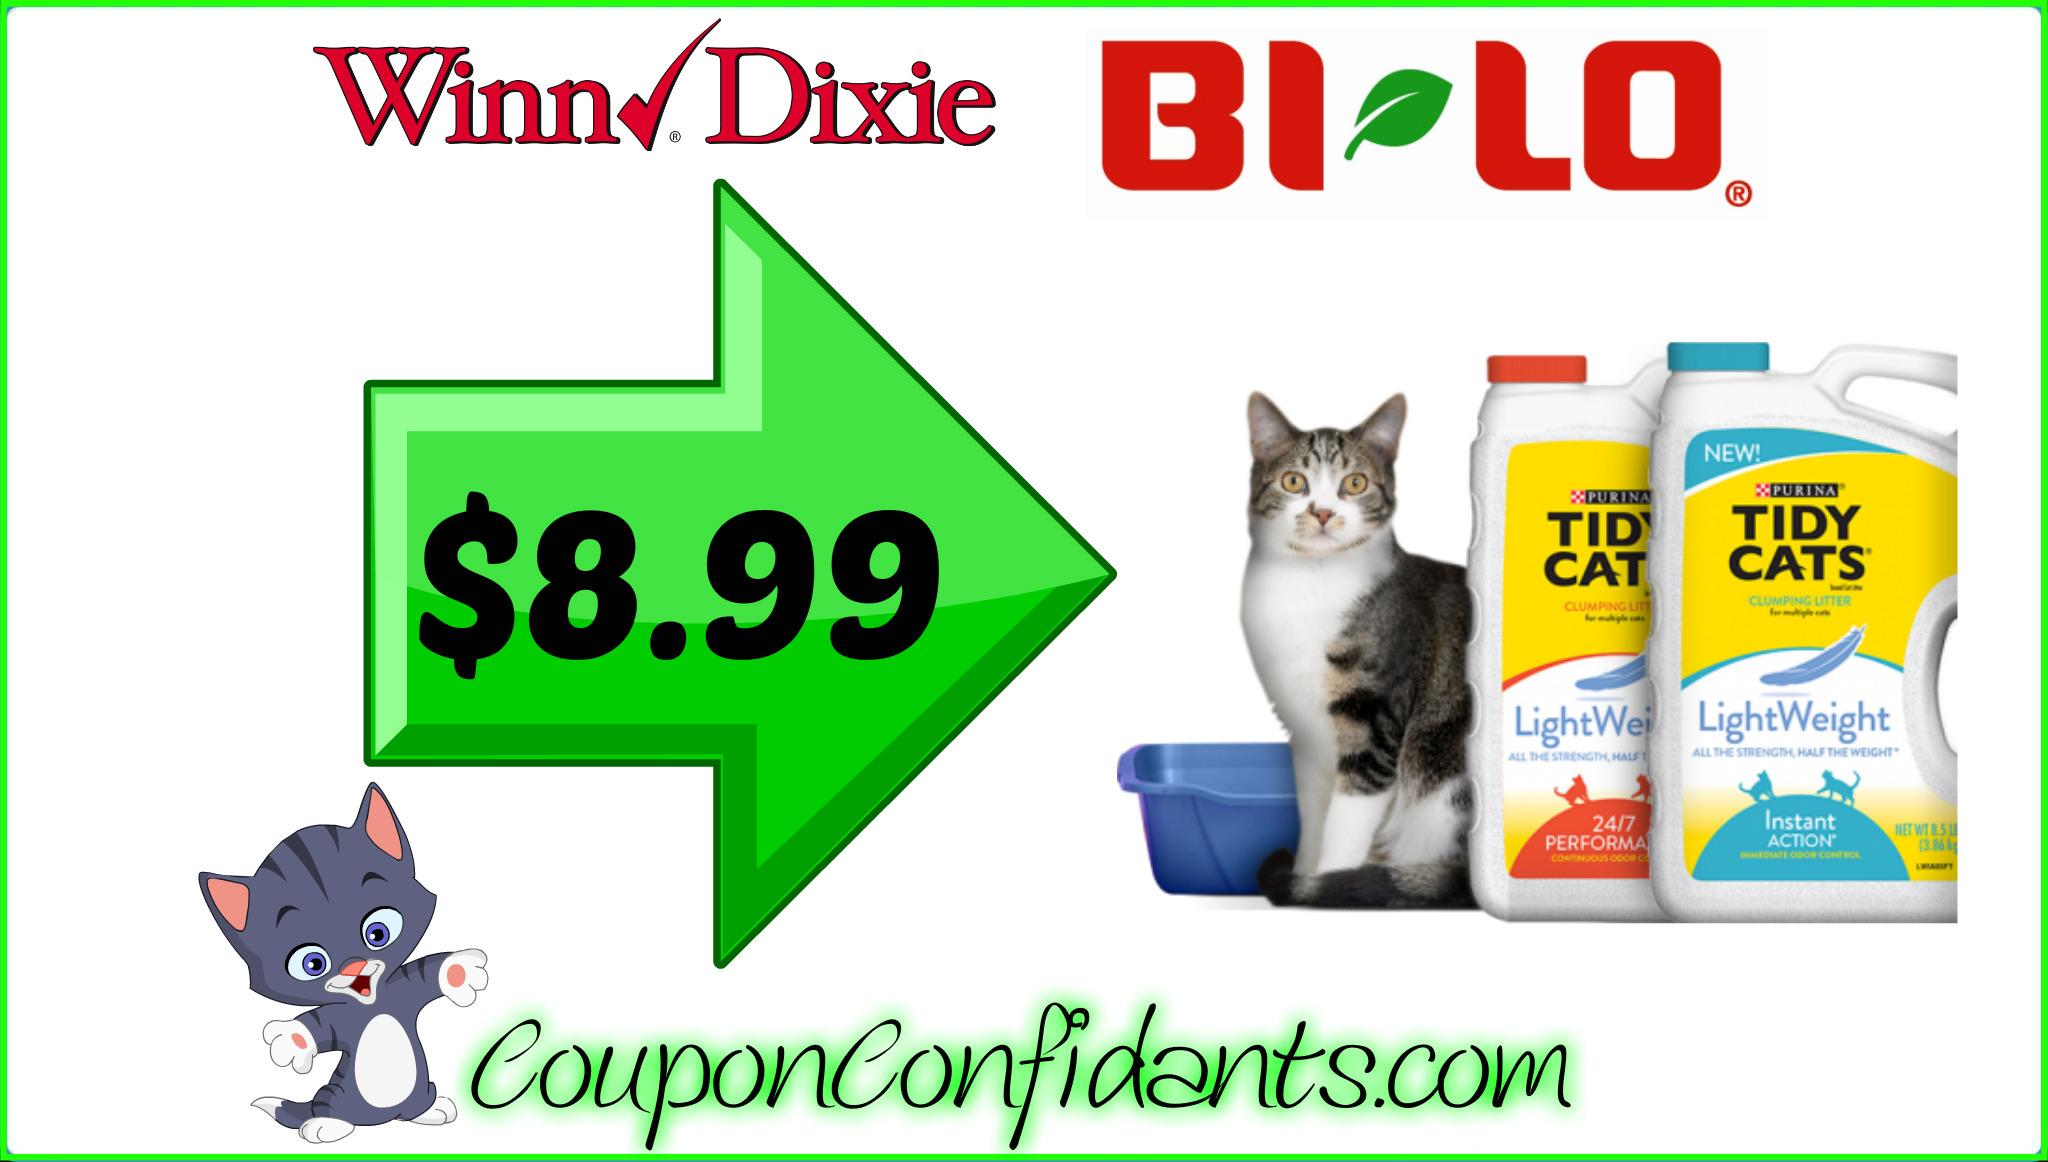 photo regarding Tidy Cat Printable 3.00 Coupon known as Tidy Cats bundle at Winn Dixie and Bi-lo! ⋆ Coupon Confidants